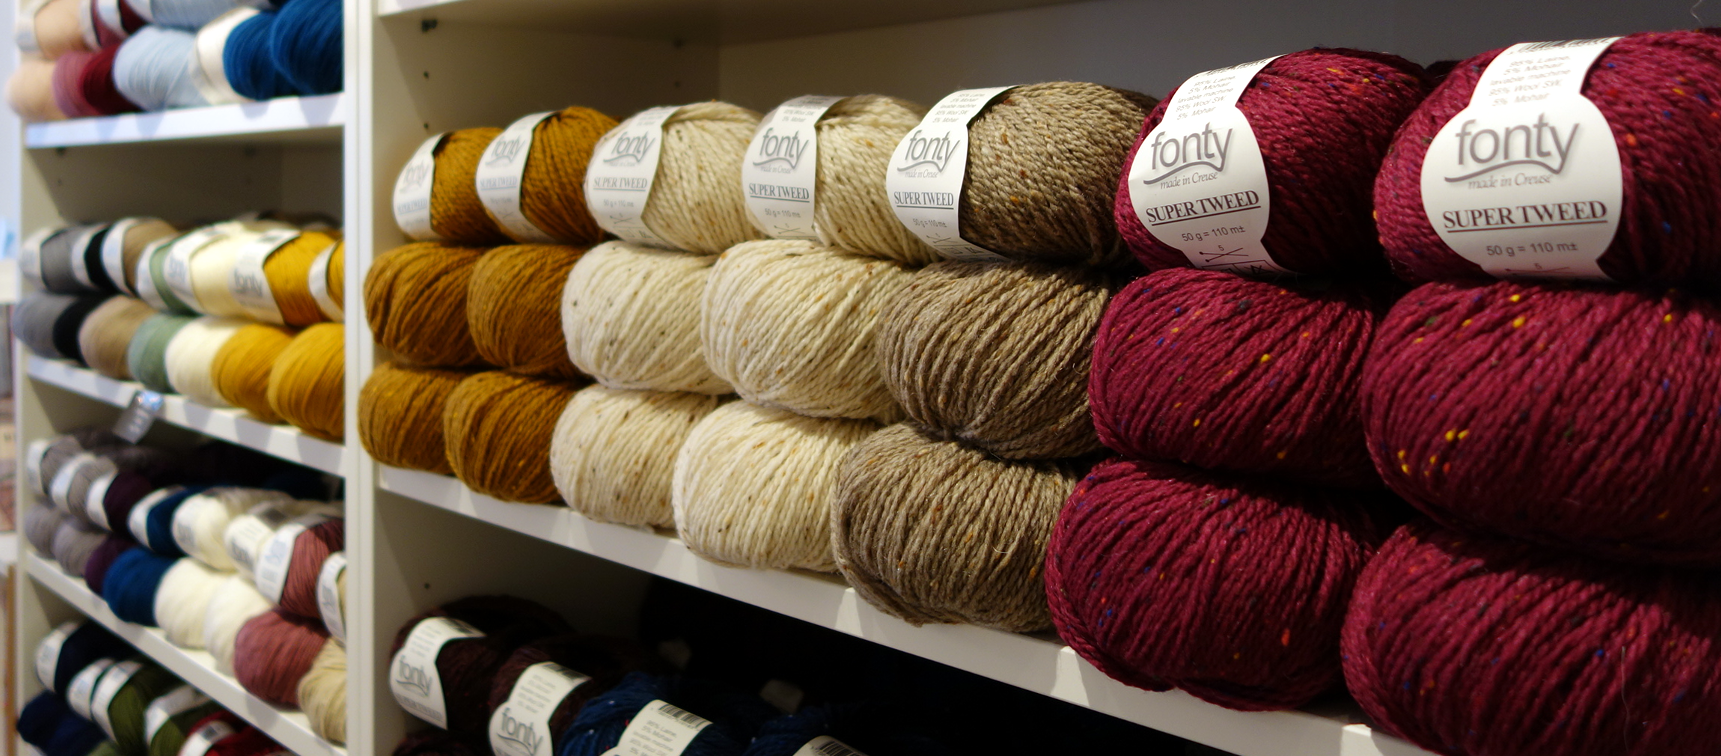 fonty laines mercerie tricot